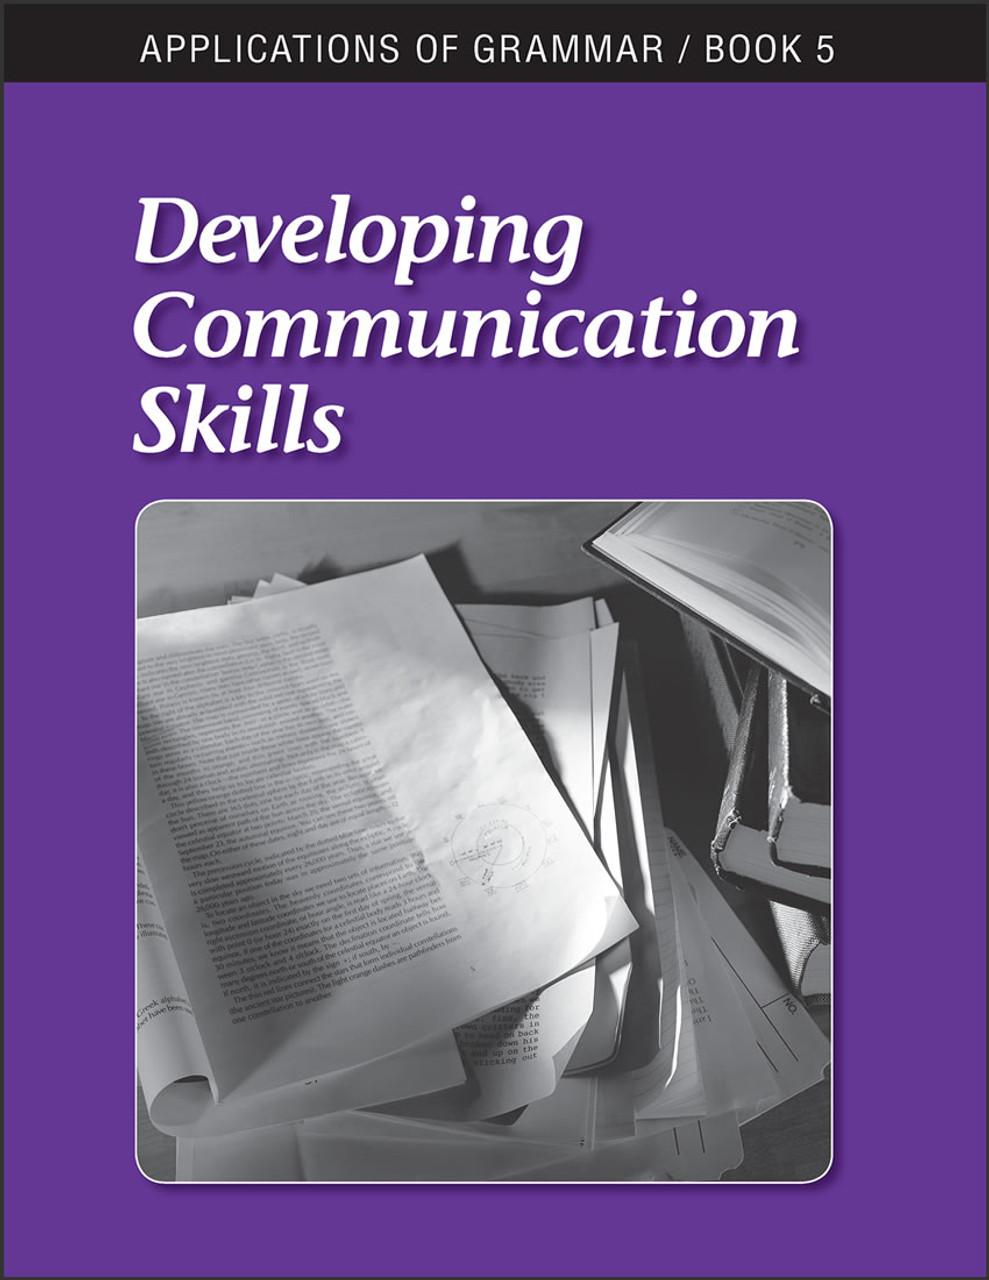 Applications of Grammar 5: Developing Communication Skills